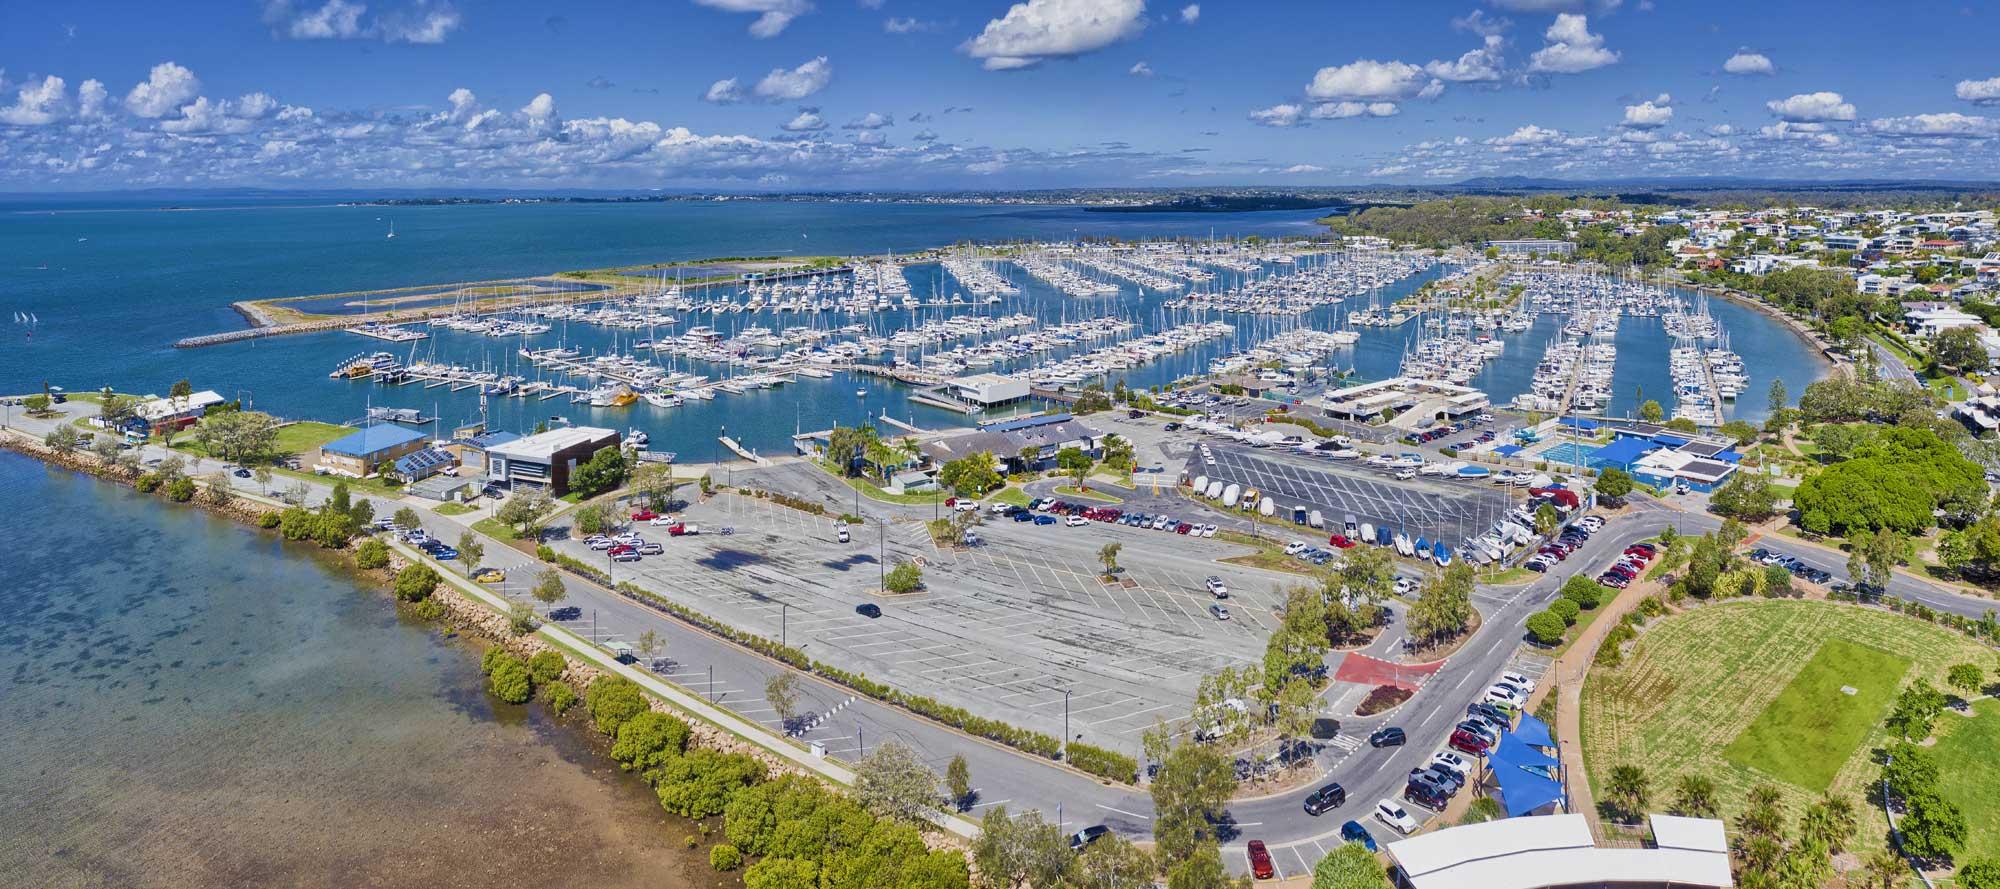 Drone Photography Brisbane - Many Boat Club